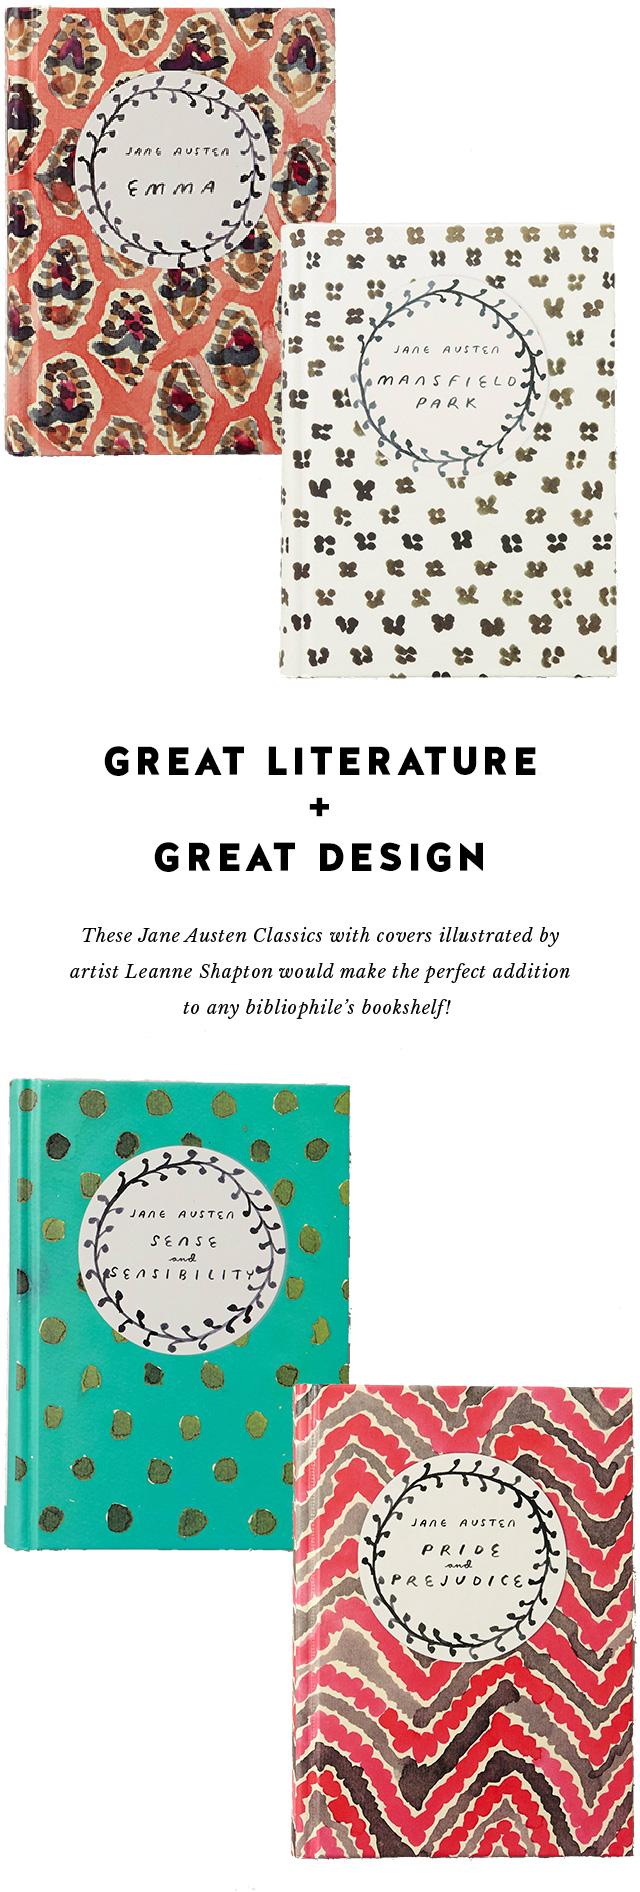 leanne-shapton-jane-austen-classics